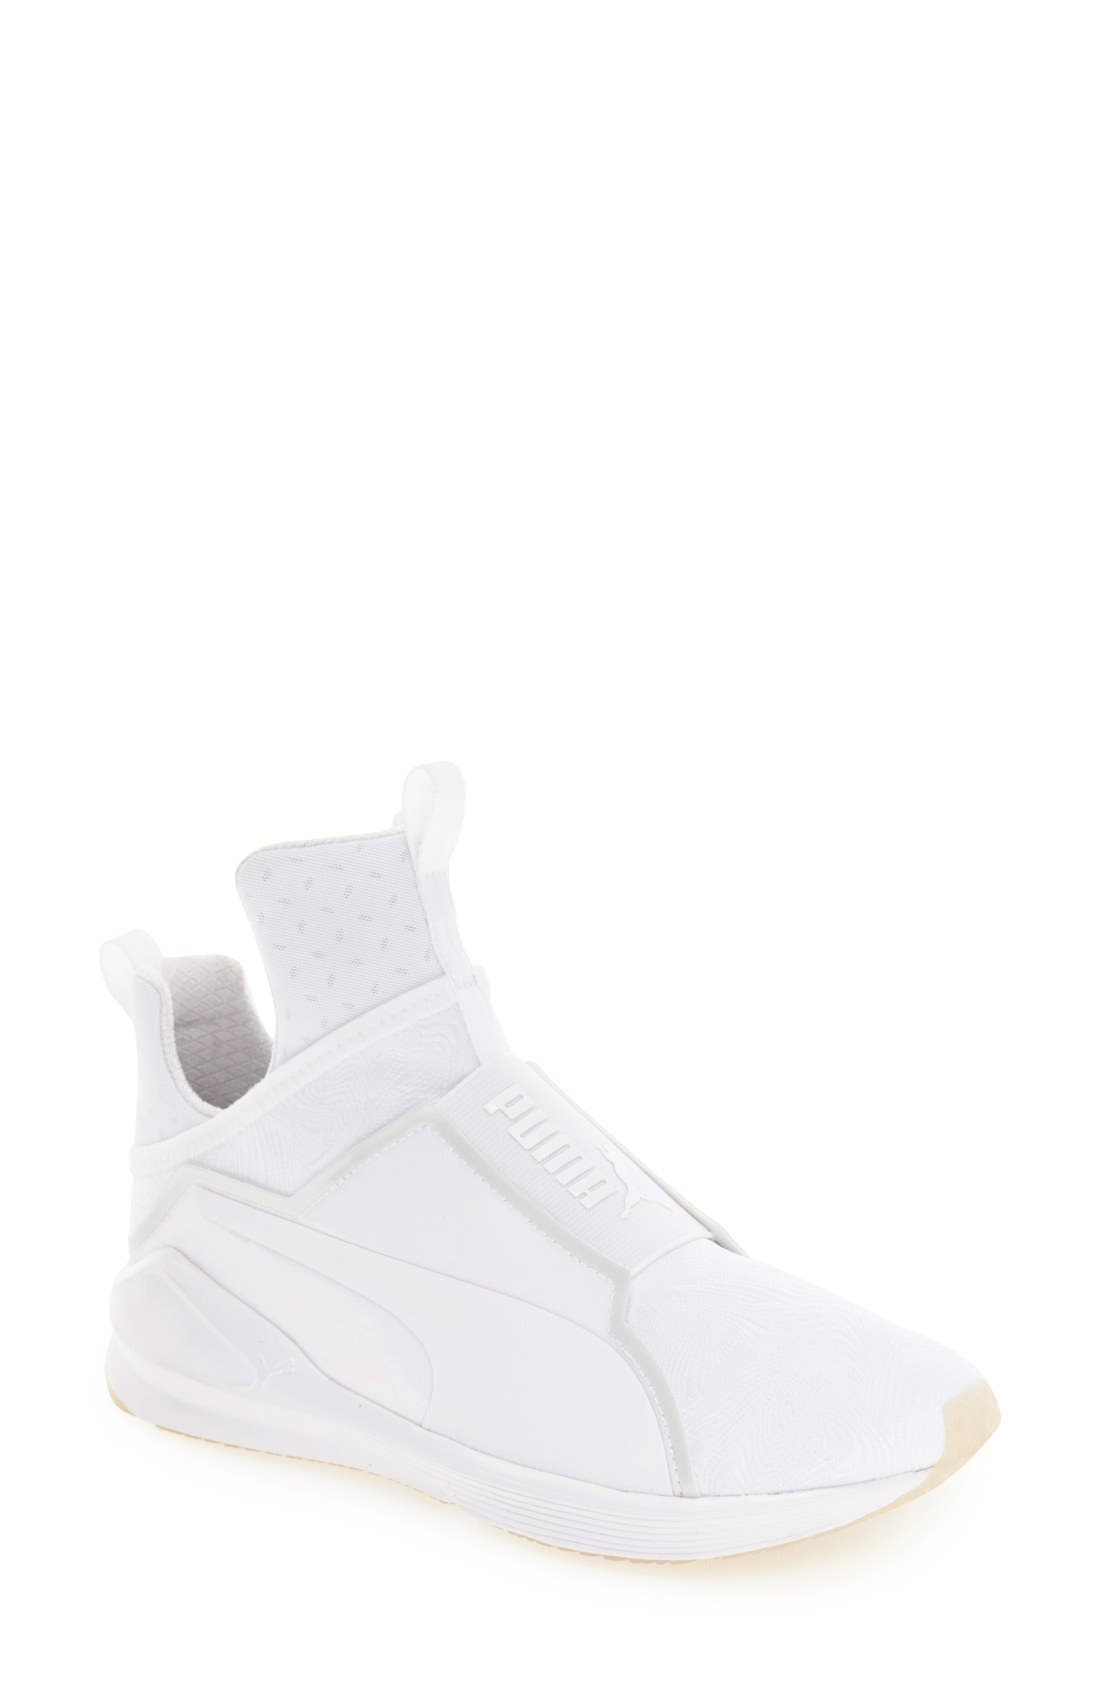 PUMA 'Fierce Bright' Sneaker, Main, color, 100